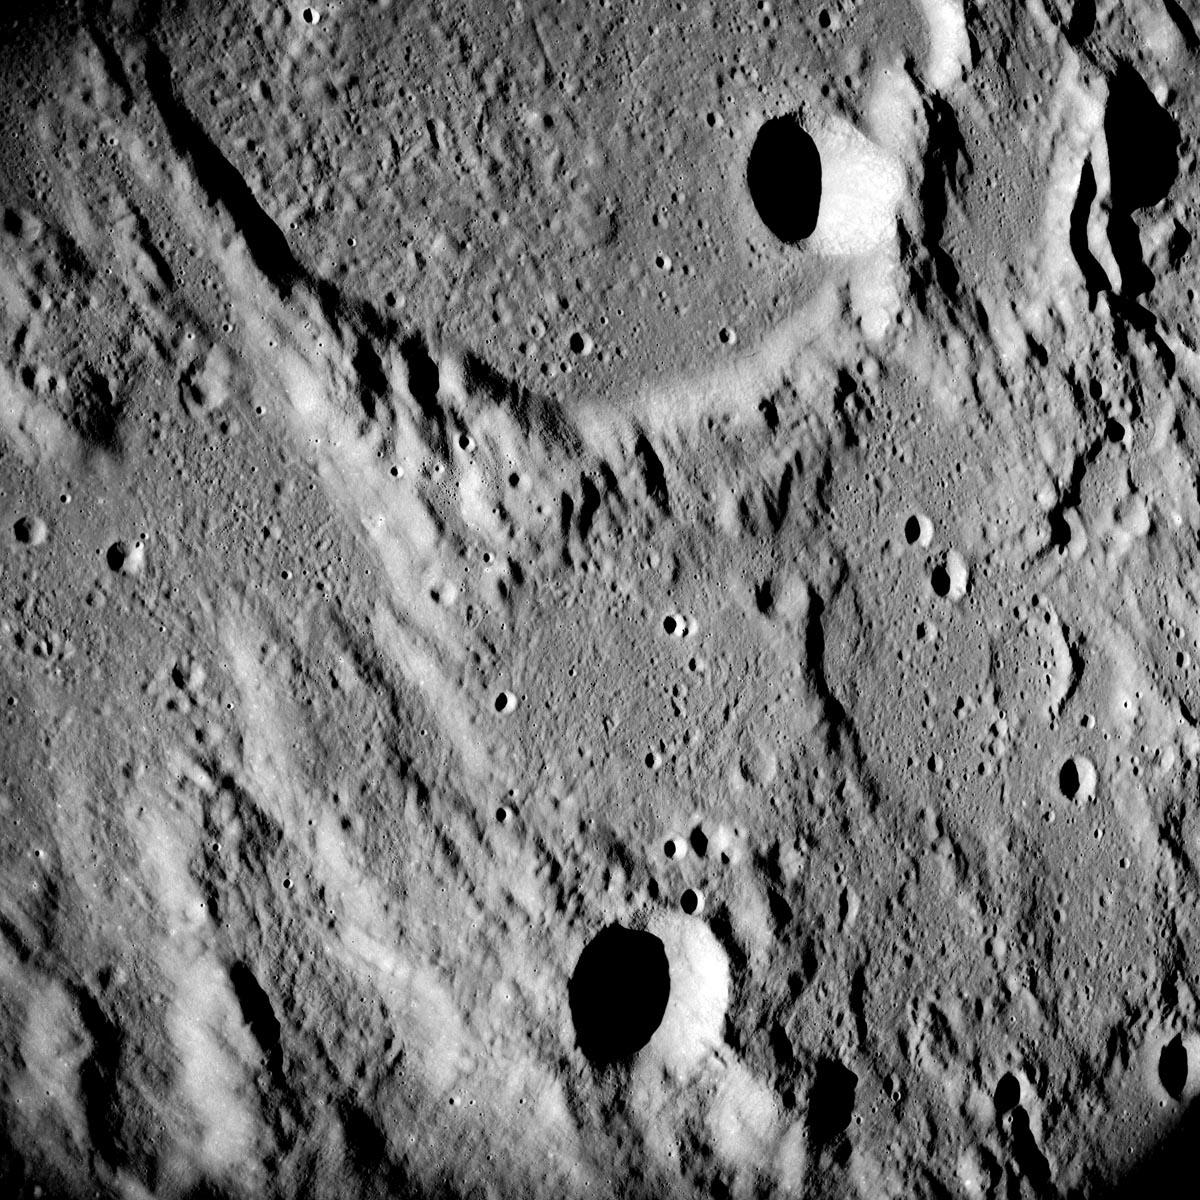 пирамиды на луне фото вас платежи